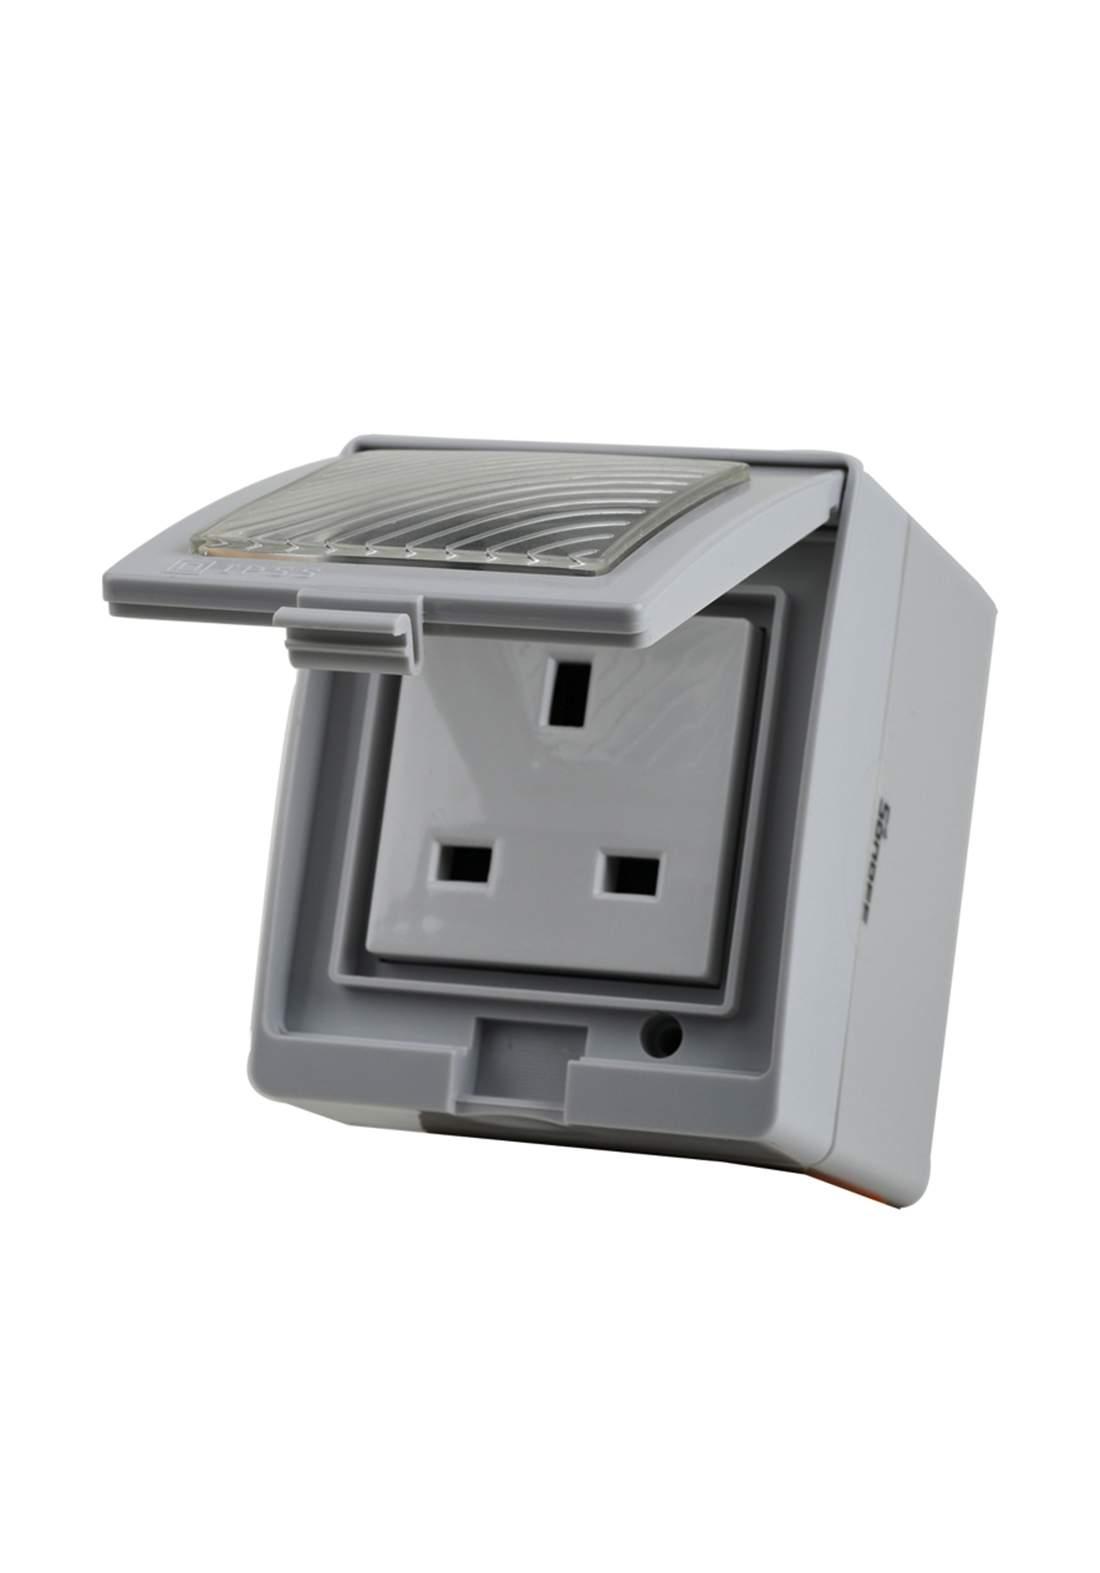 Sonoff S55TPG Wi-Fi Smart Waterproof Socket UK Plugمقبس ذكي مقاوم للماء